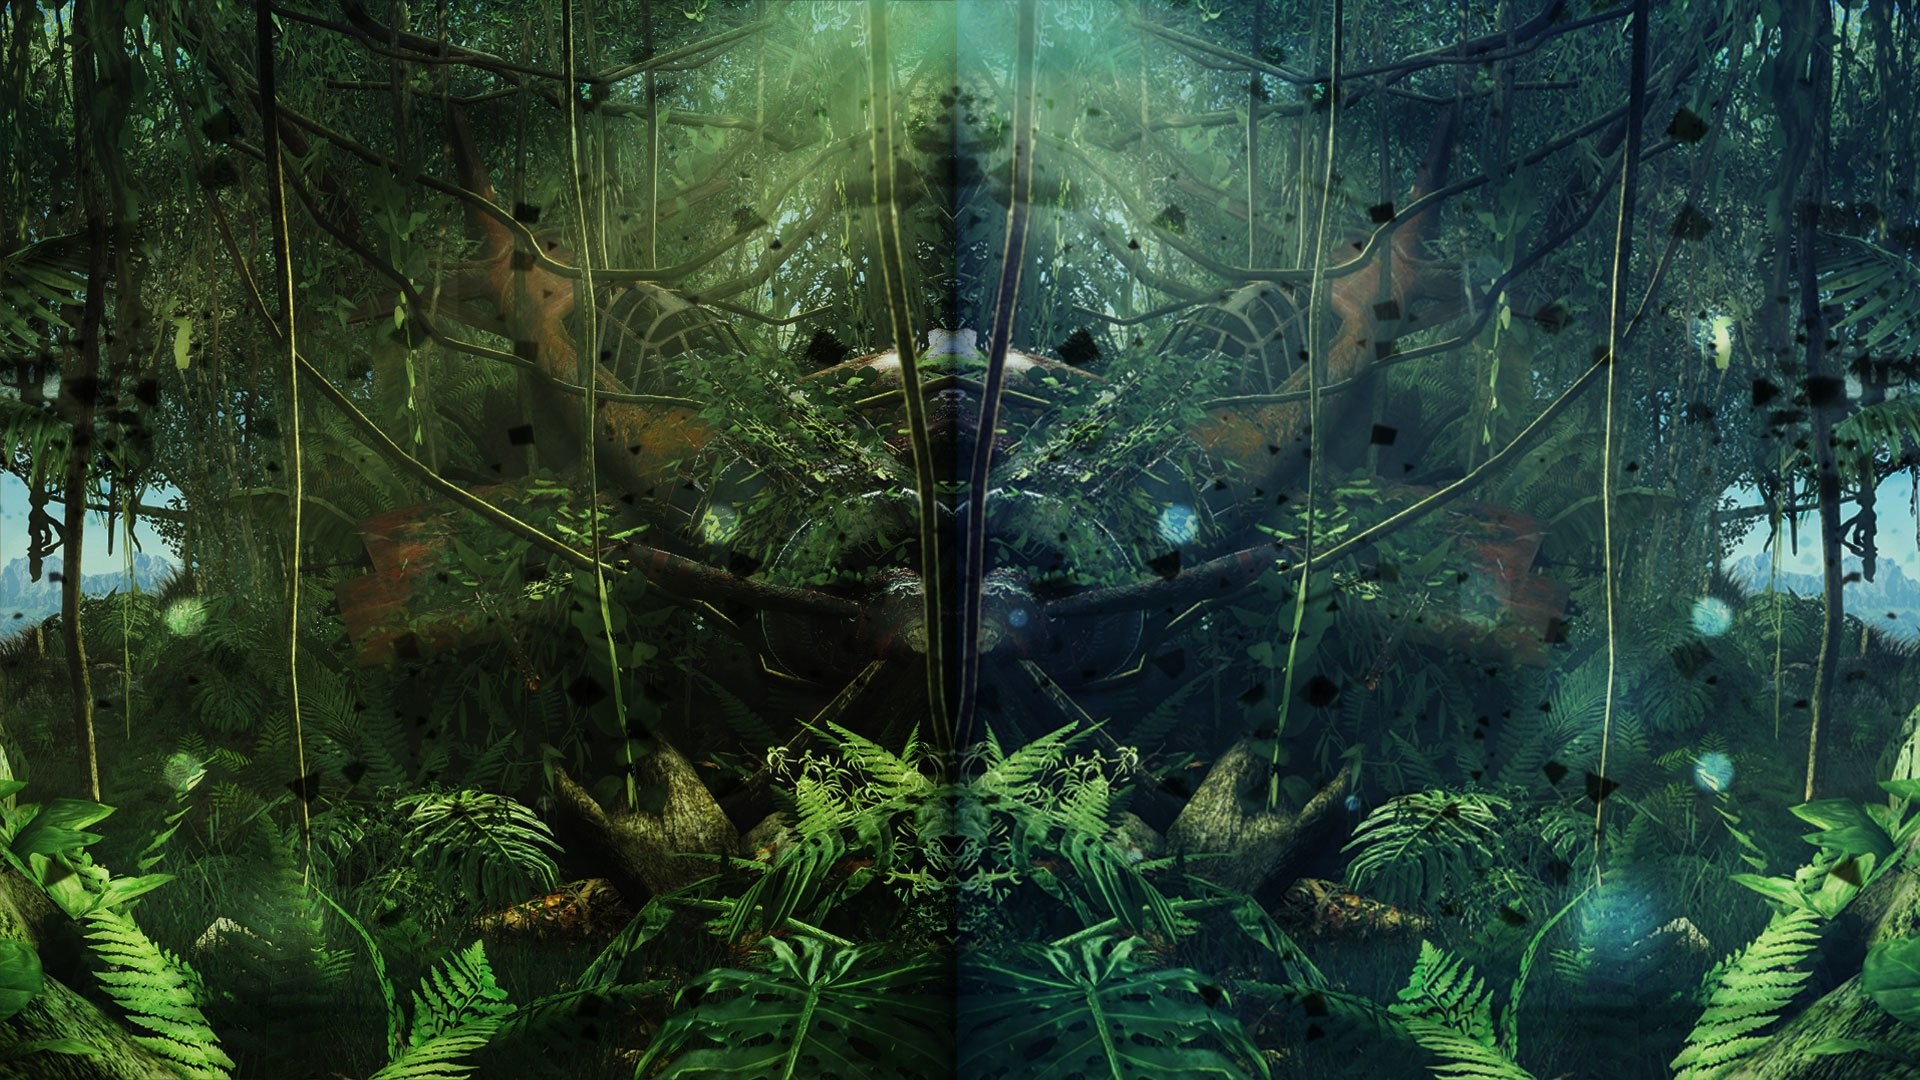 Video Game – Far Cry 3 Jungle Wallpaper